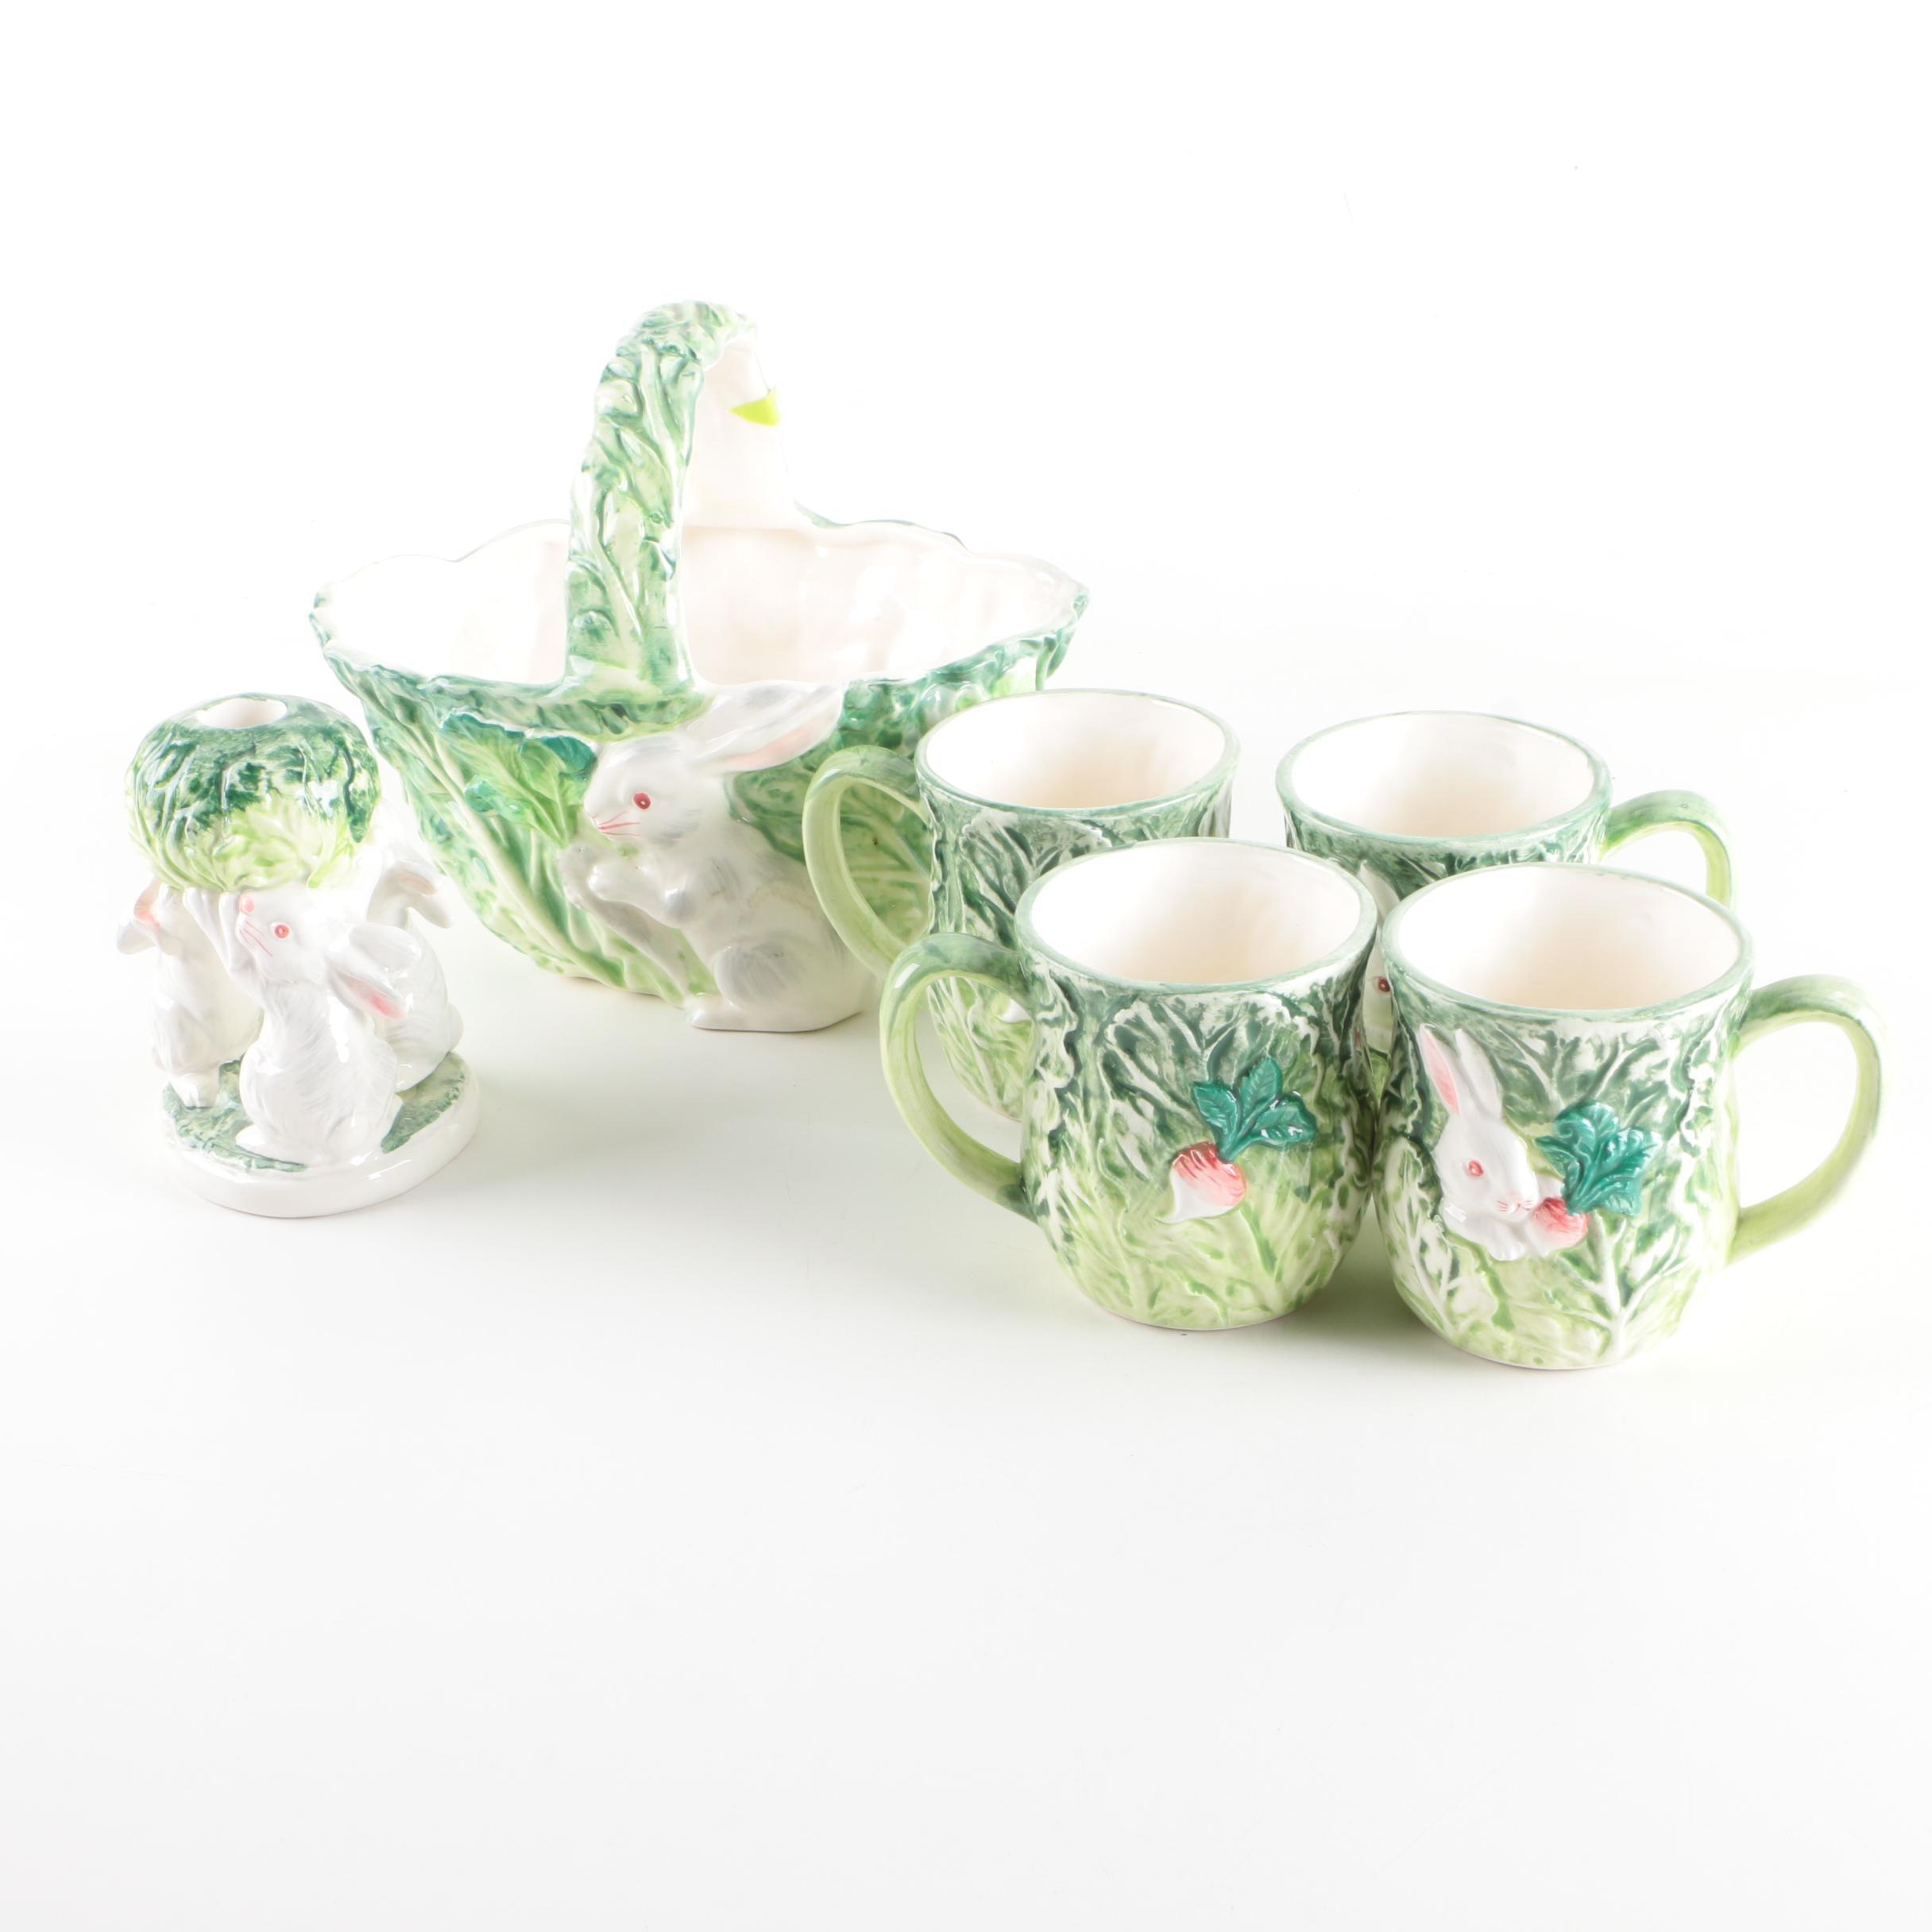 """Rabbit Patch"" Tableware by Shafford Ceramics"